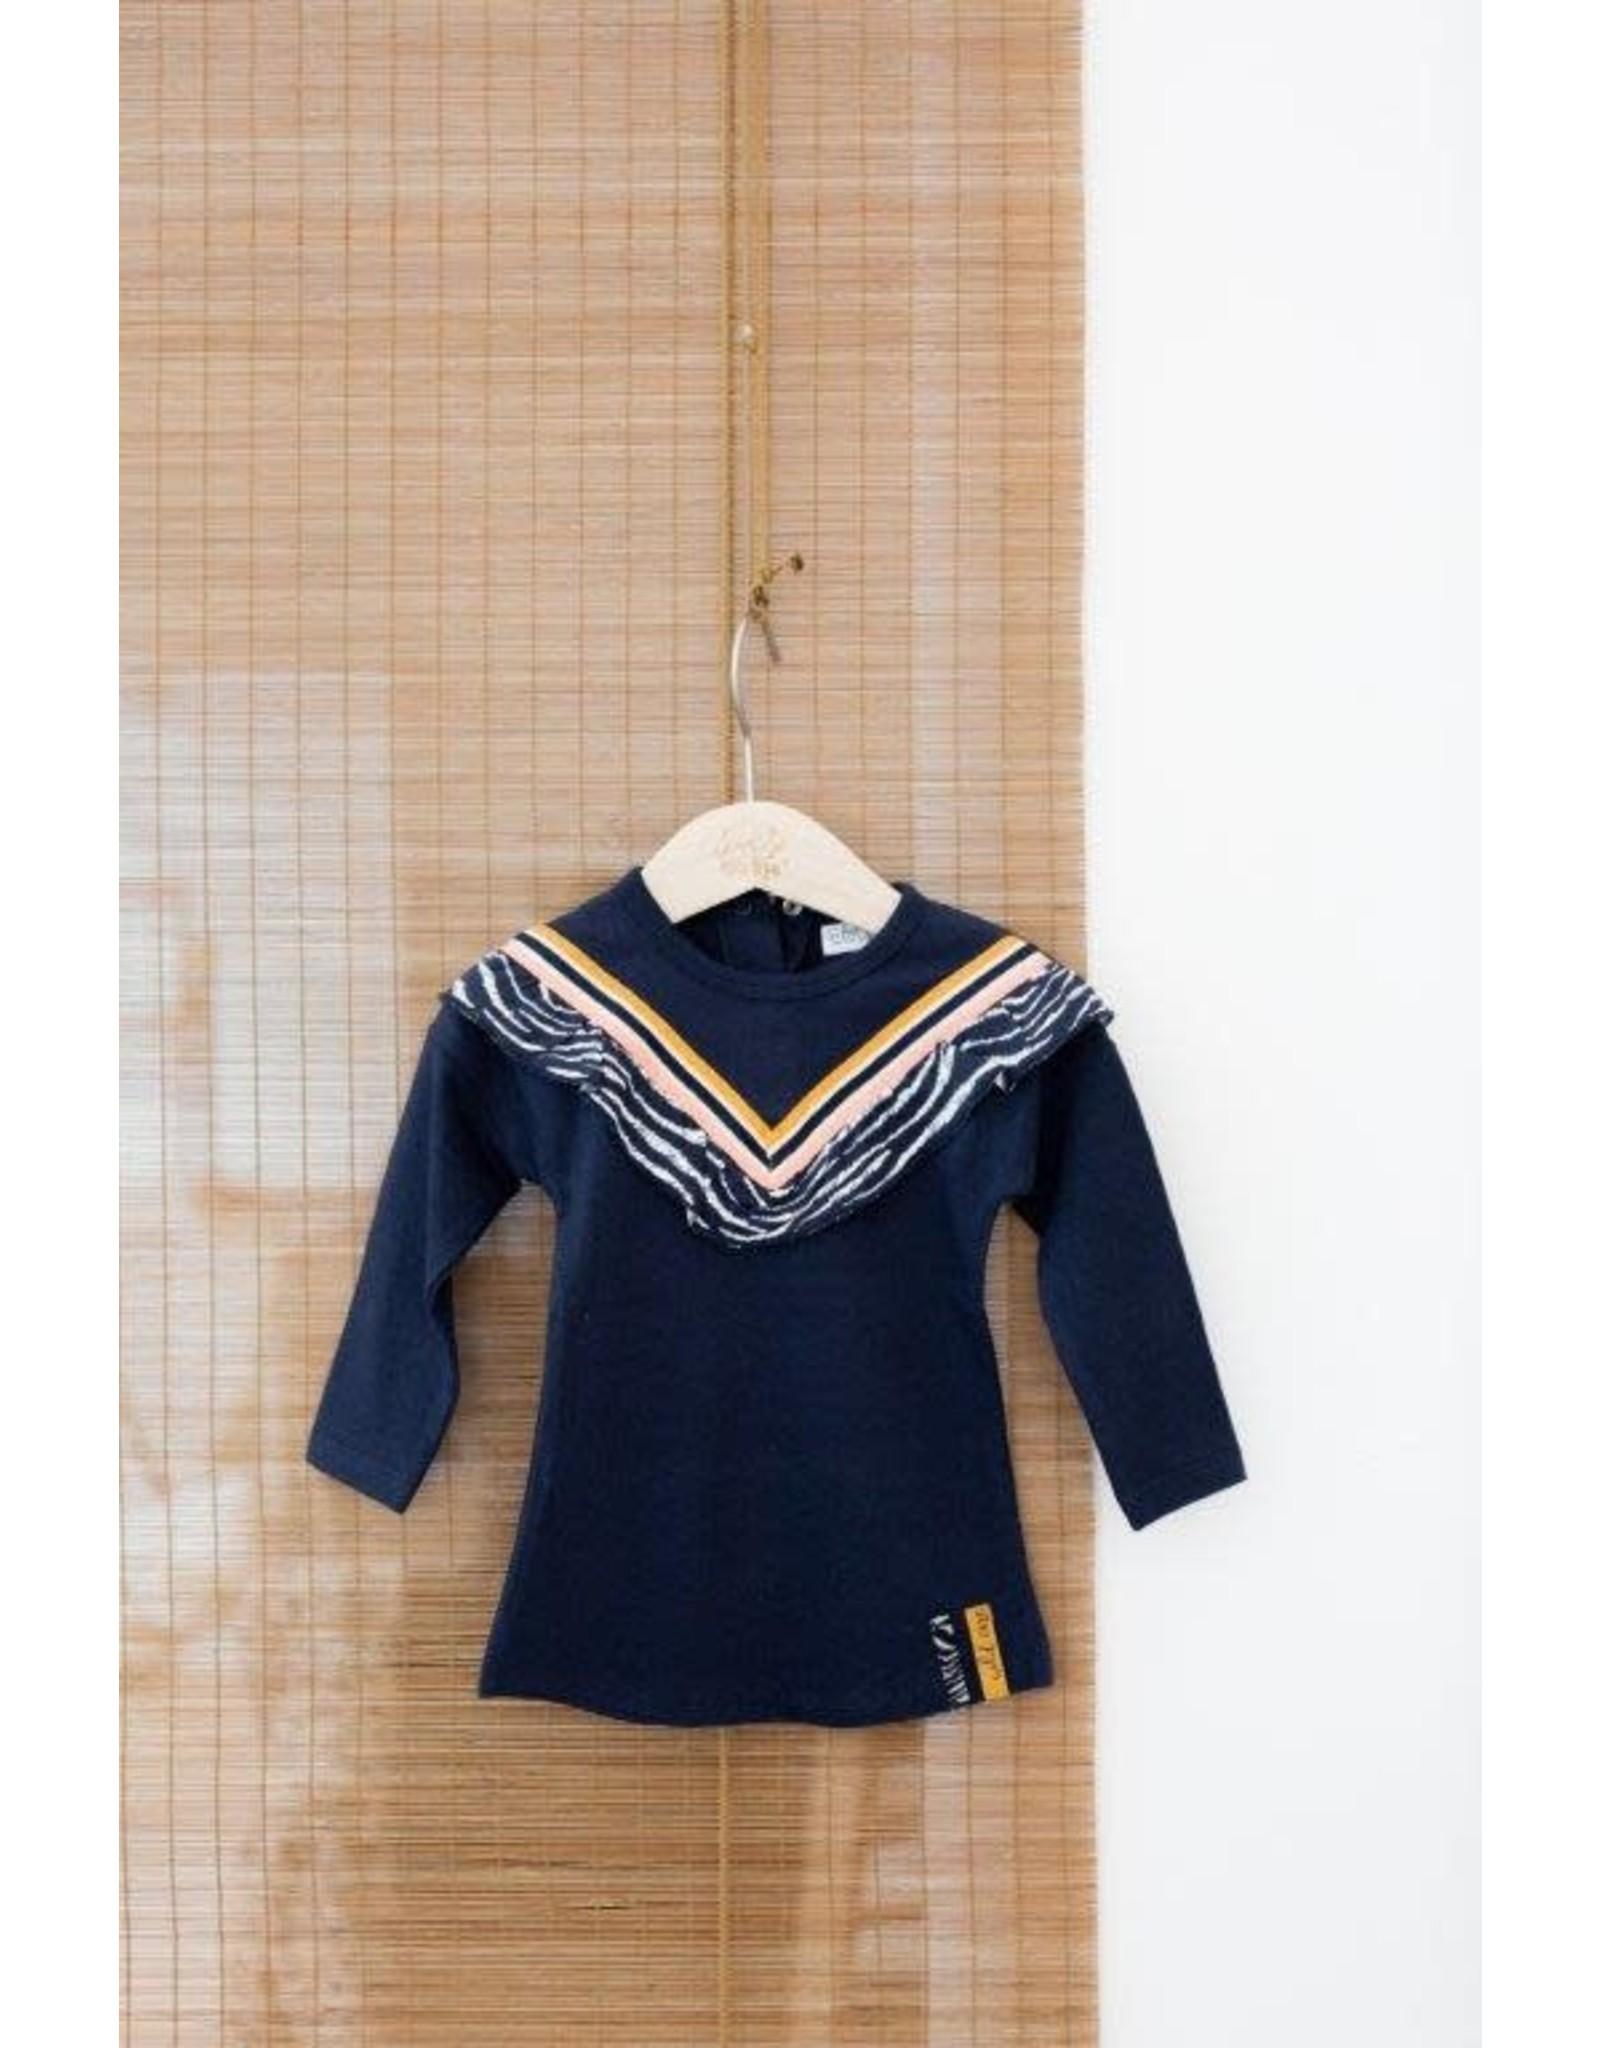 Dirkje Dirkje baby meisjes jurk met V bies en rouches Navy